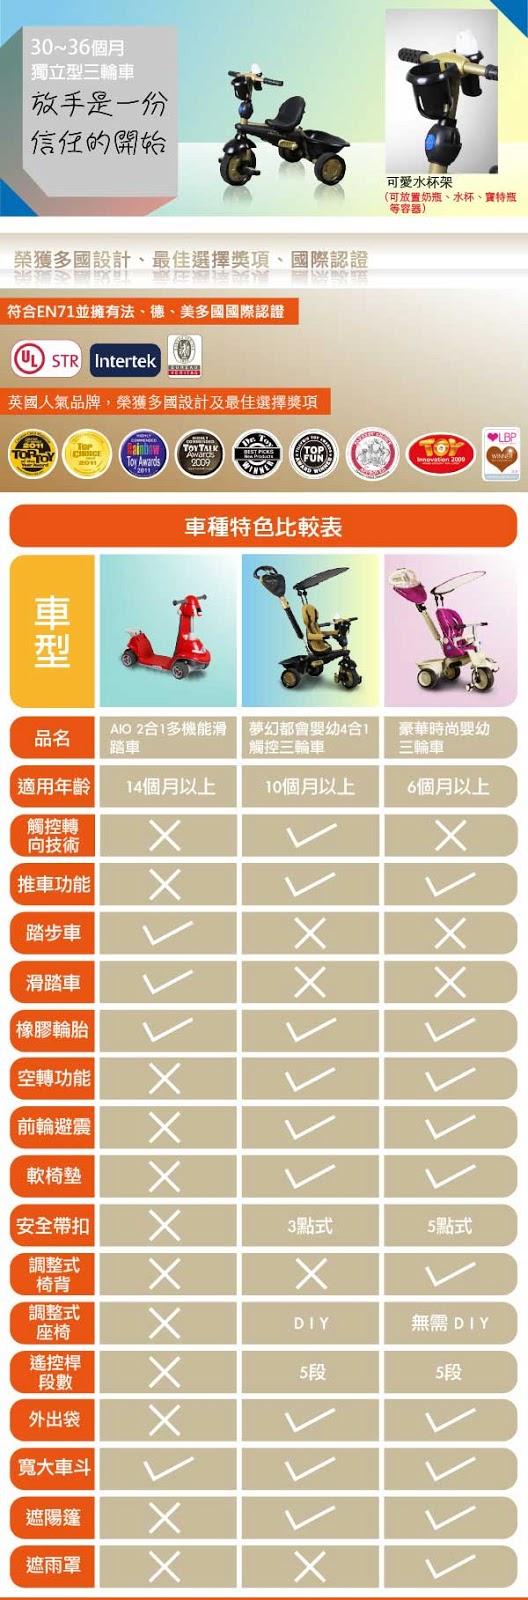 smart-trike Dream 通過各國安規認證